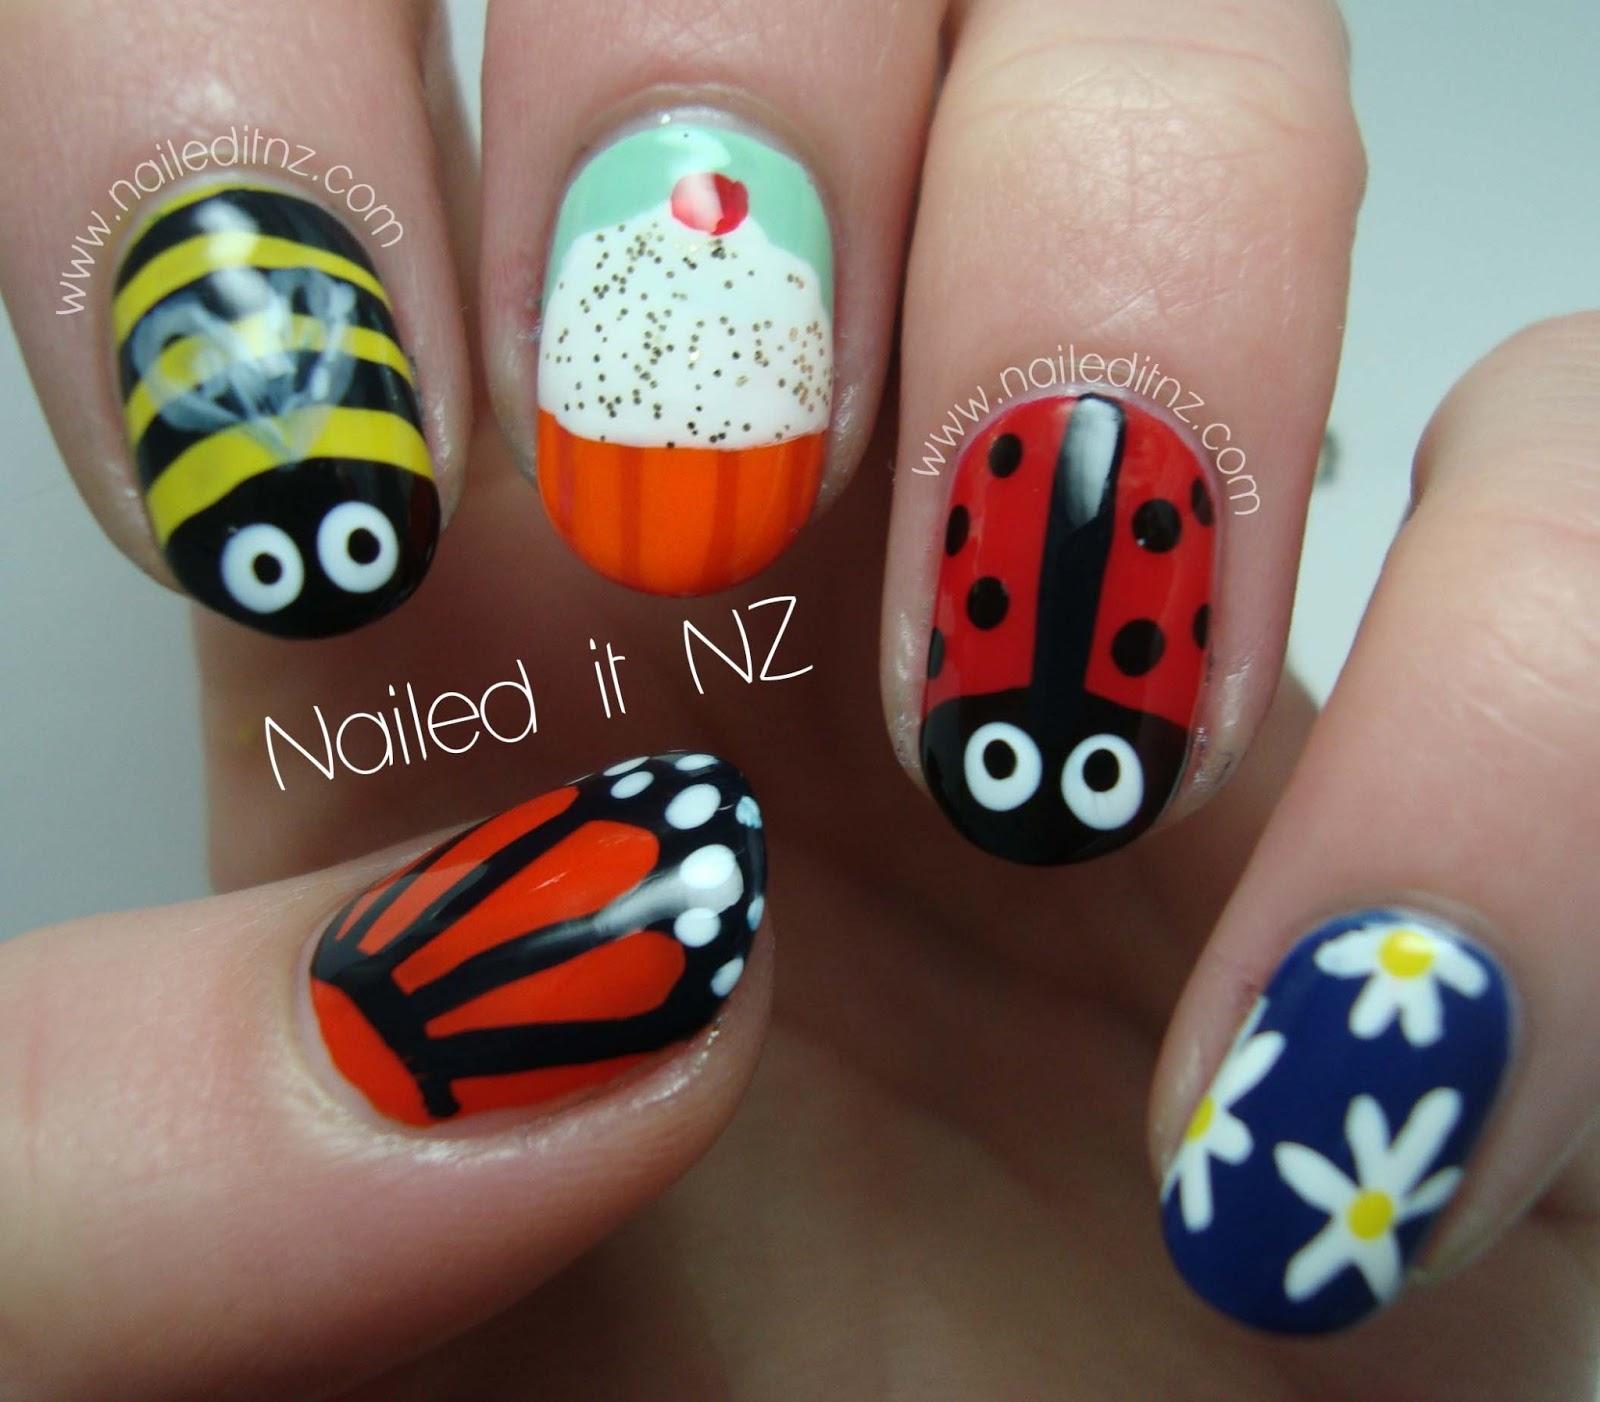 Skittle nail art - children\'s version!